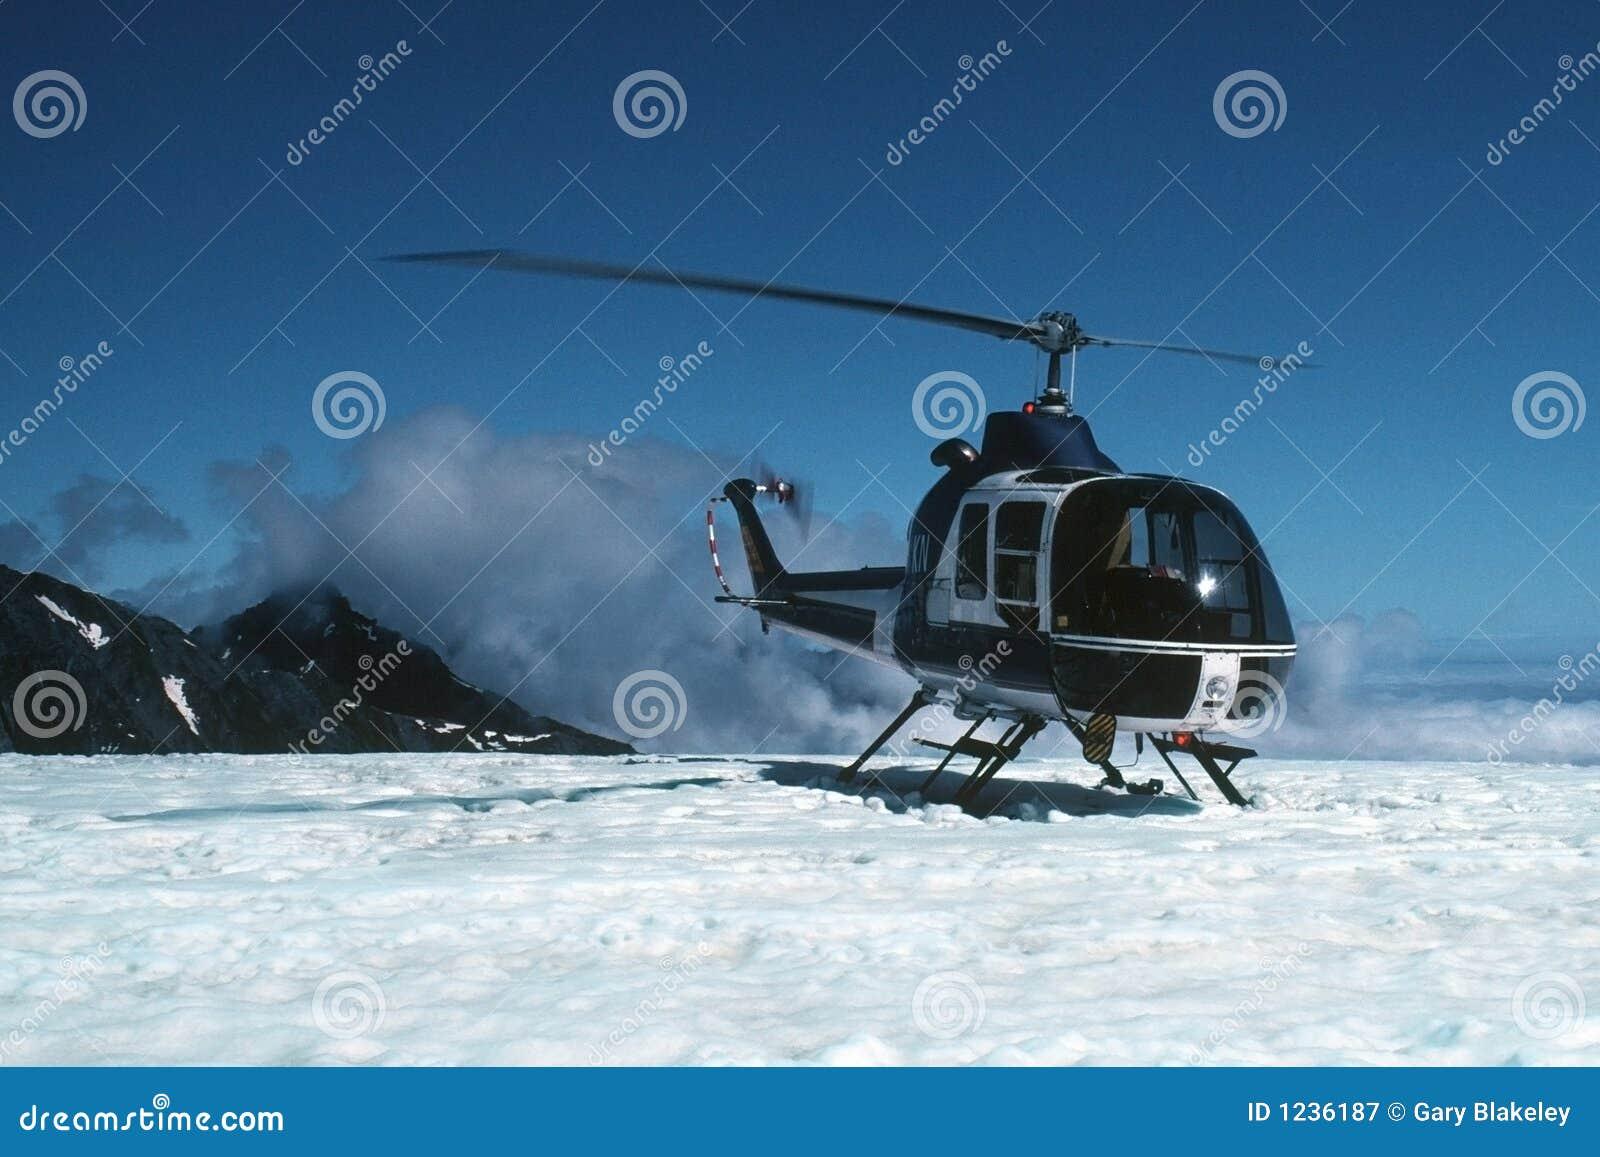 glacier chopper royalty free stock photography image. Black Bedroom Furniture Sets. Home Design Ideas